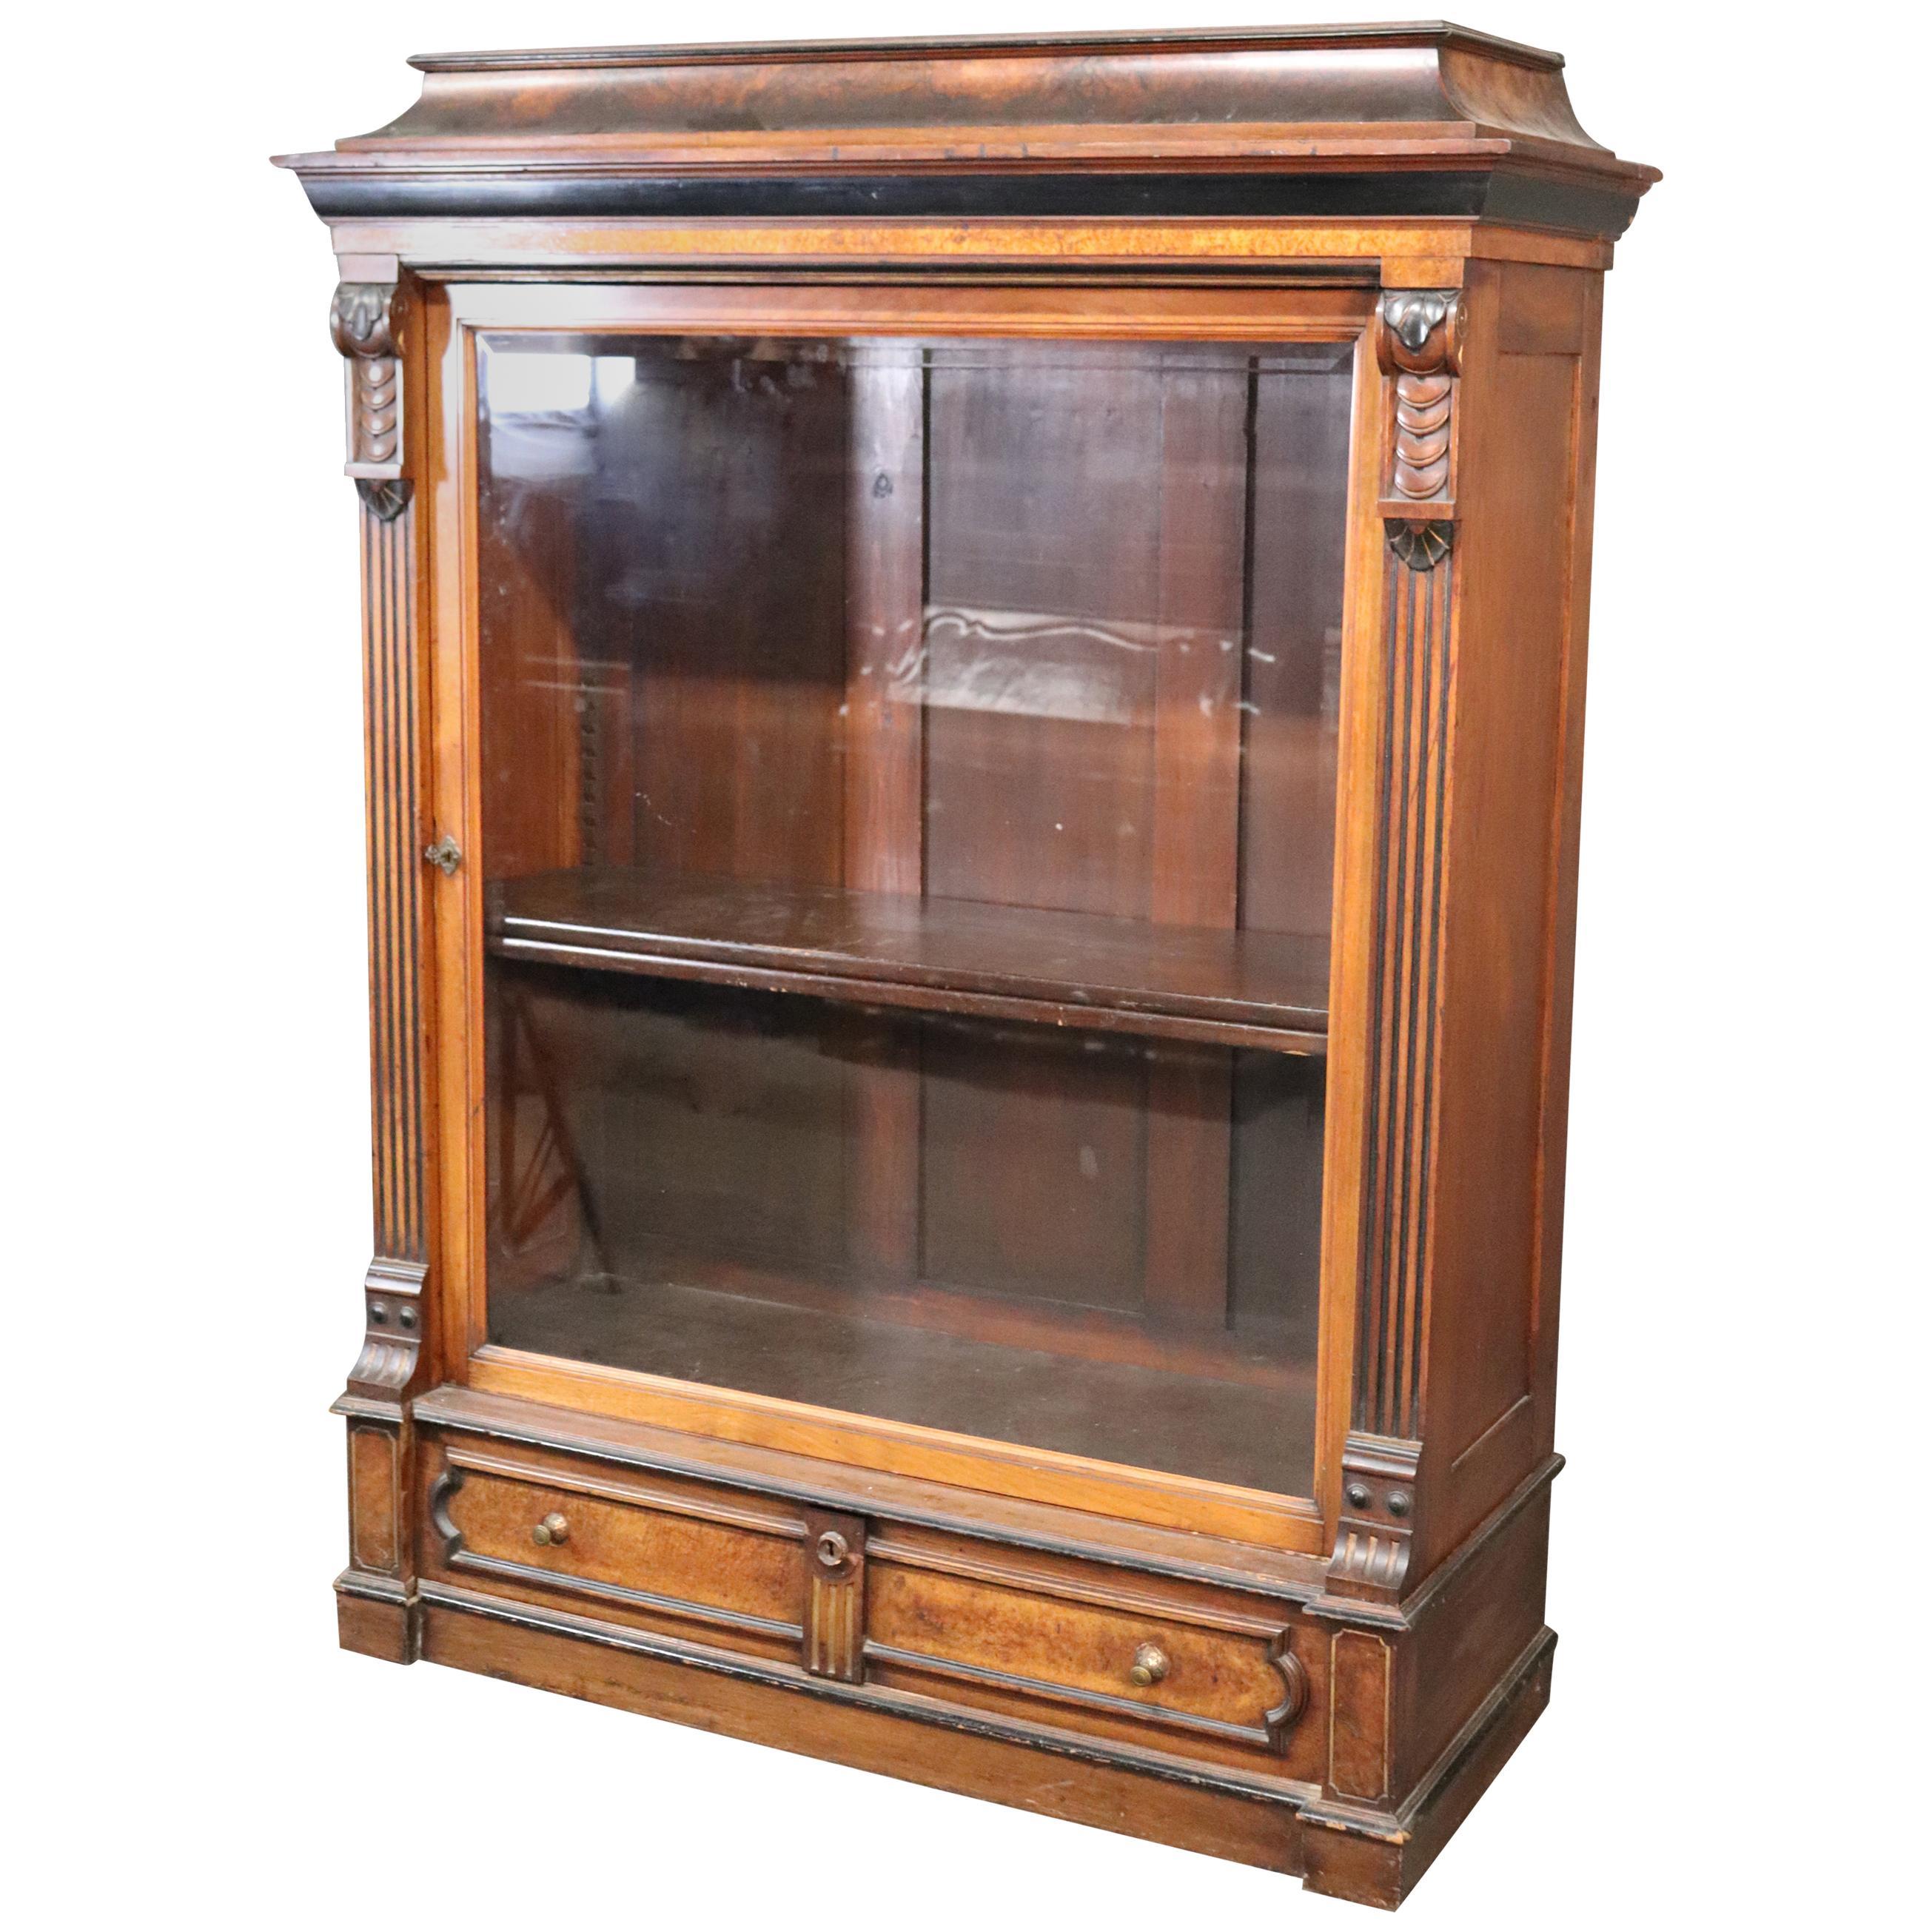 Rare American Victorian Renaissance Revival Burled Walnut Vitrine Bookcase C1870